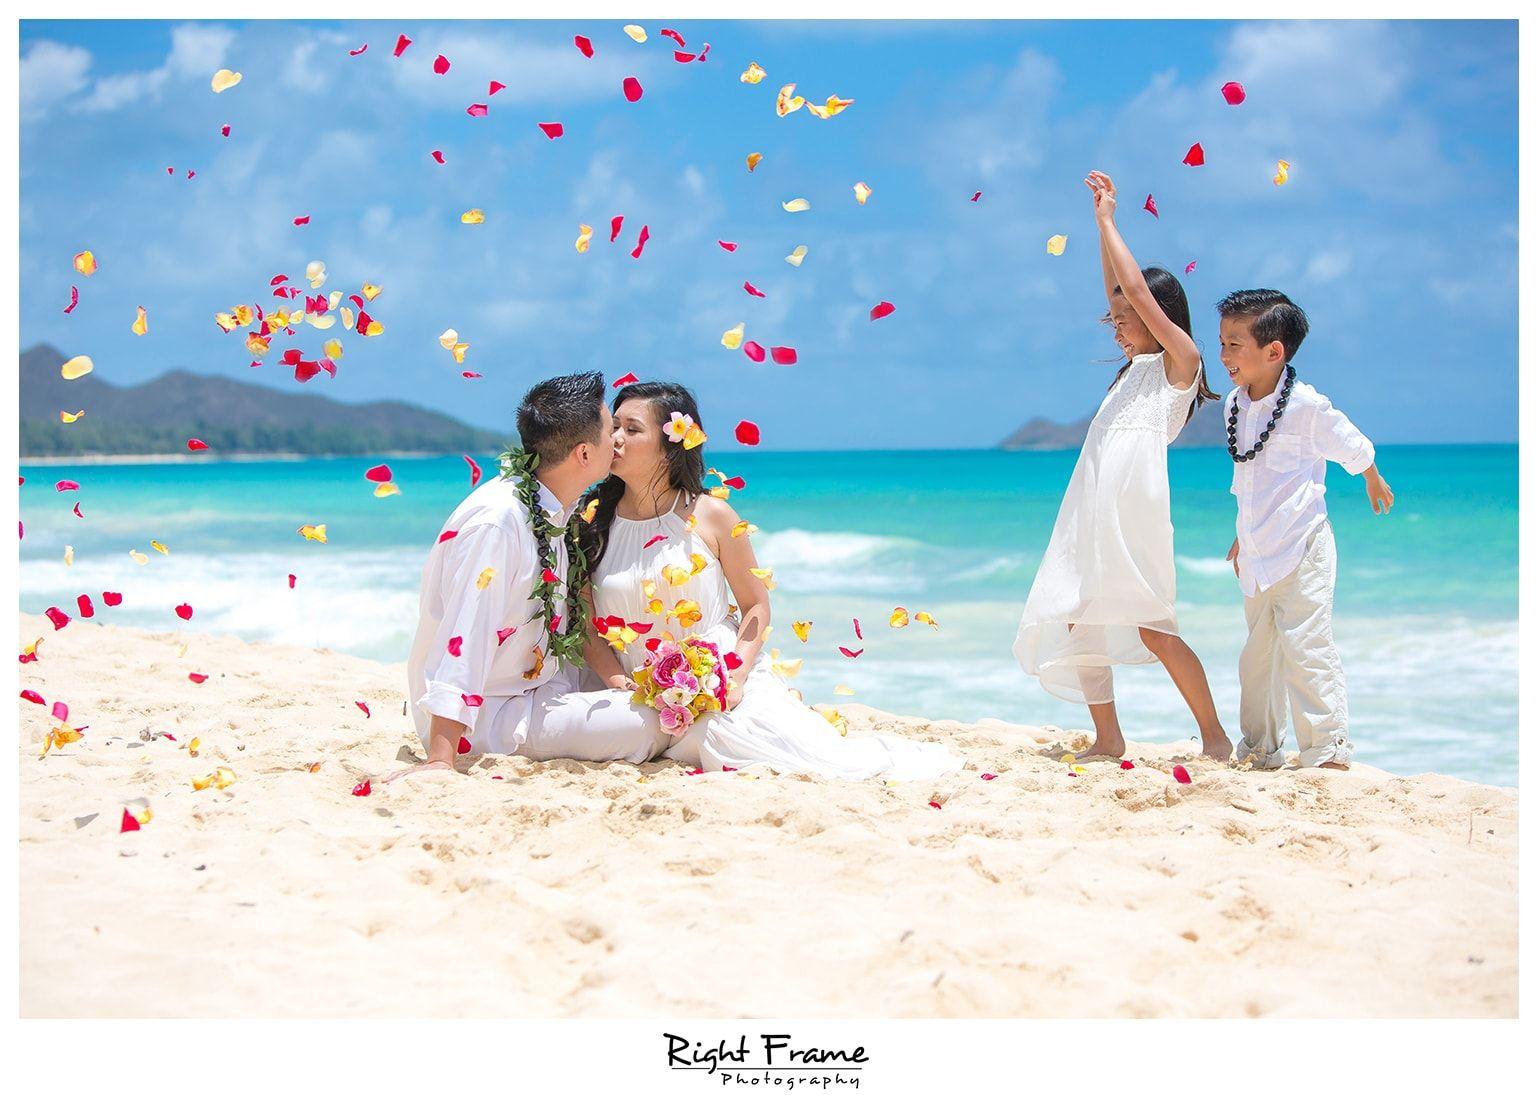 Beach Wedding Ceremony Oahu: Www.rightframephotography.com